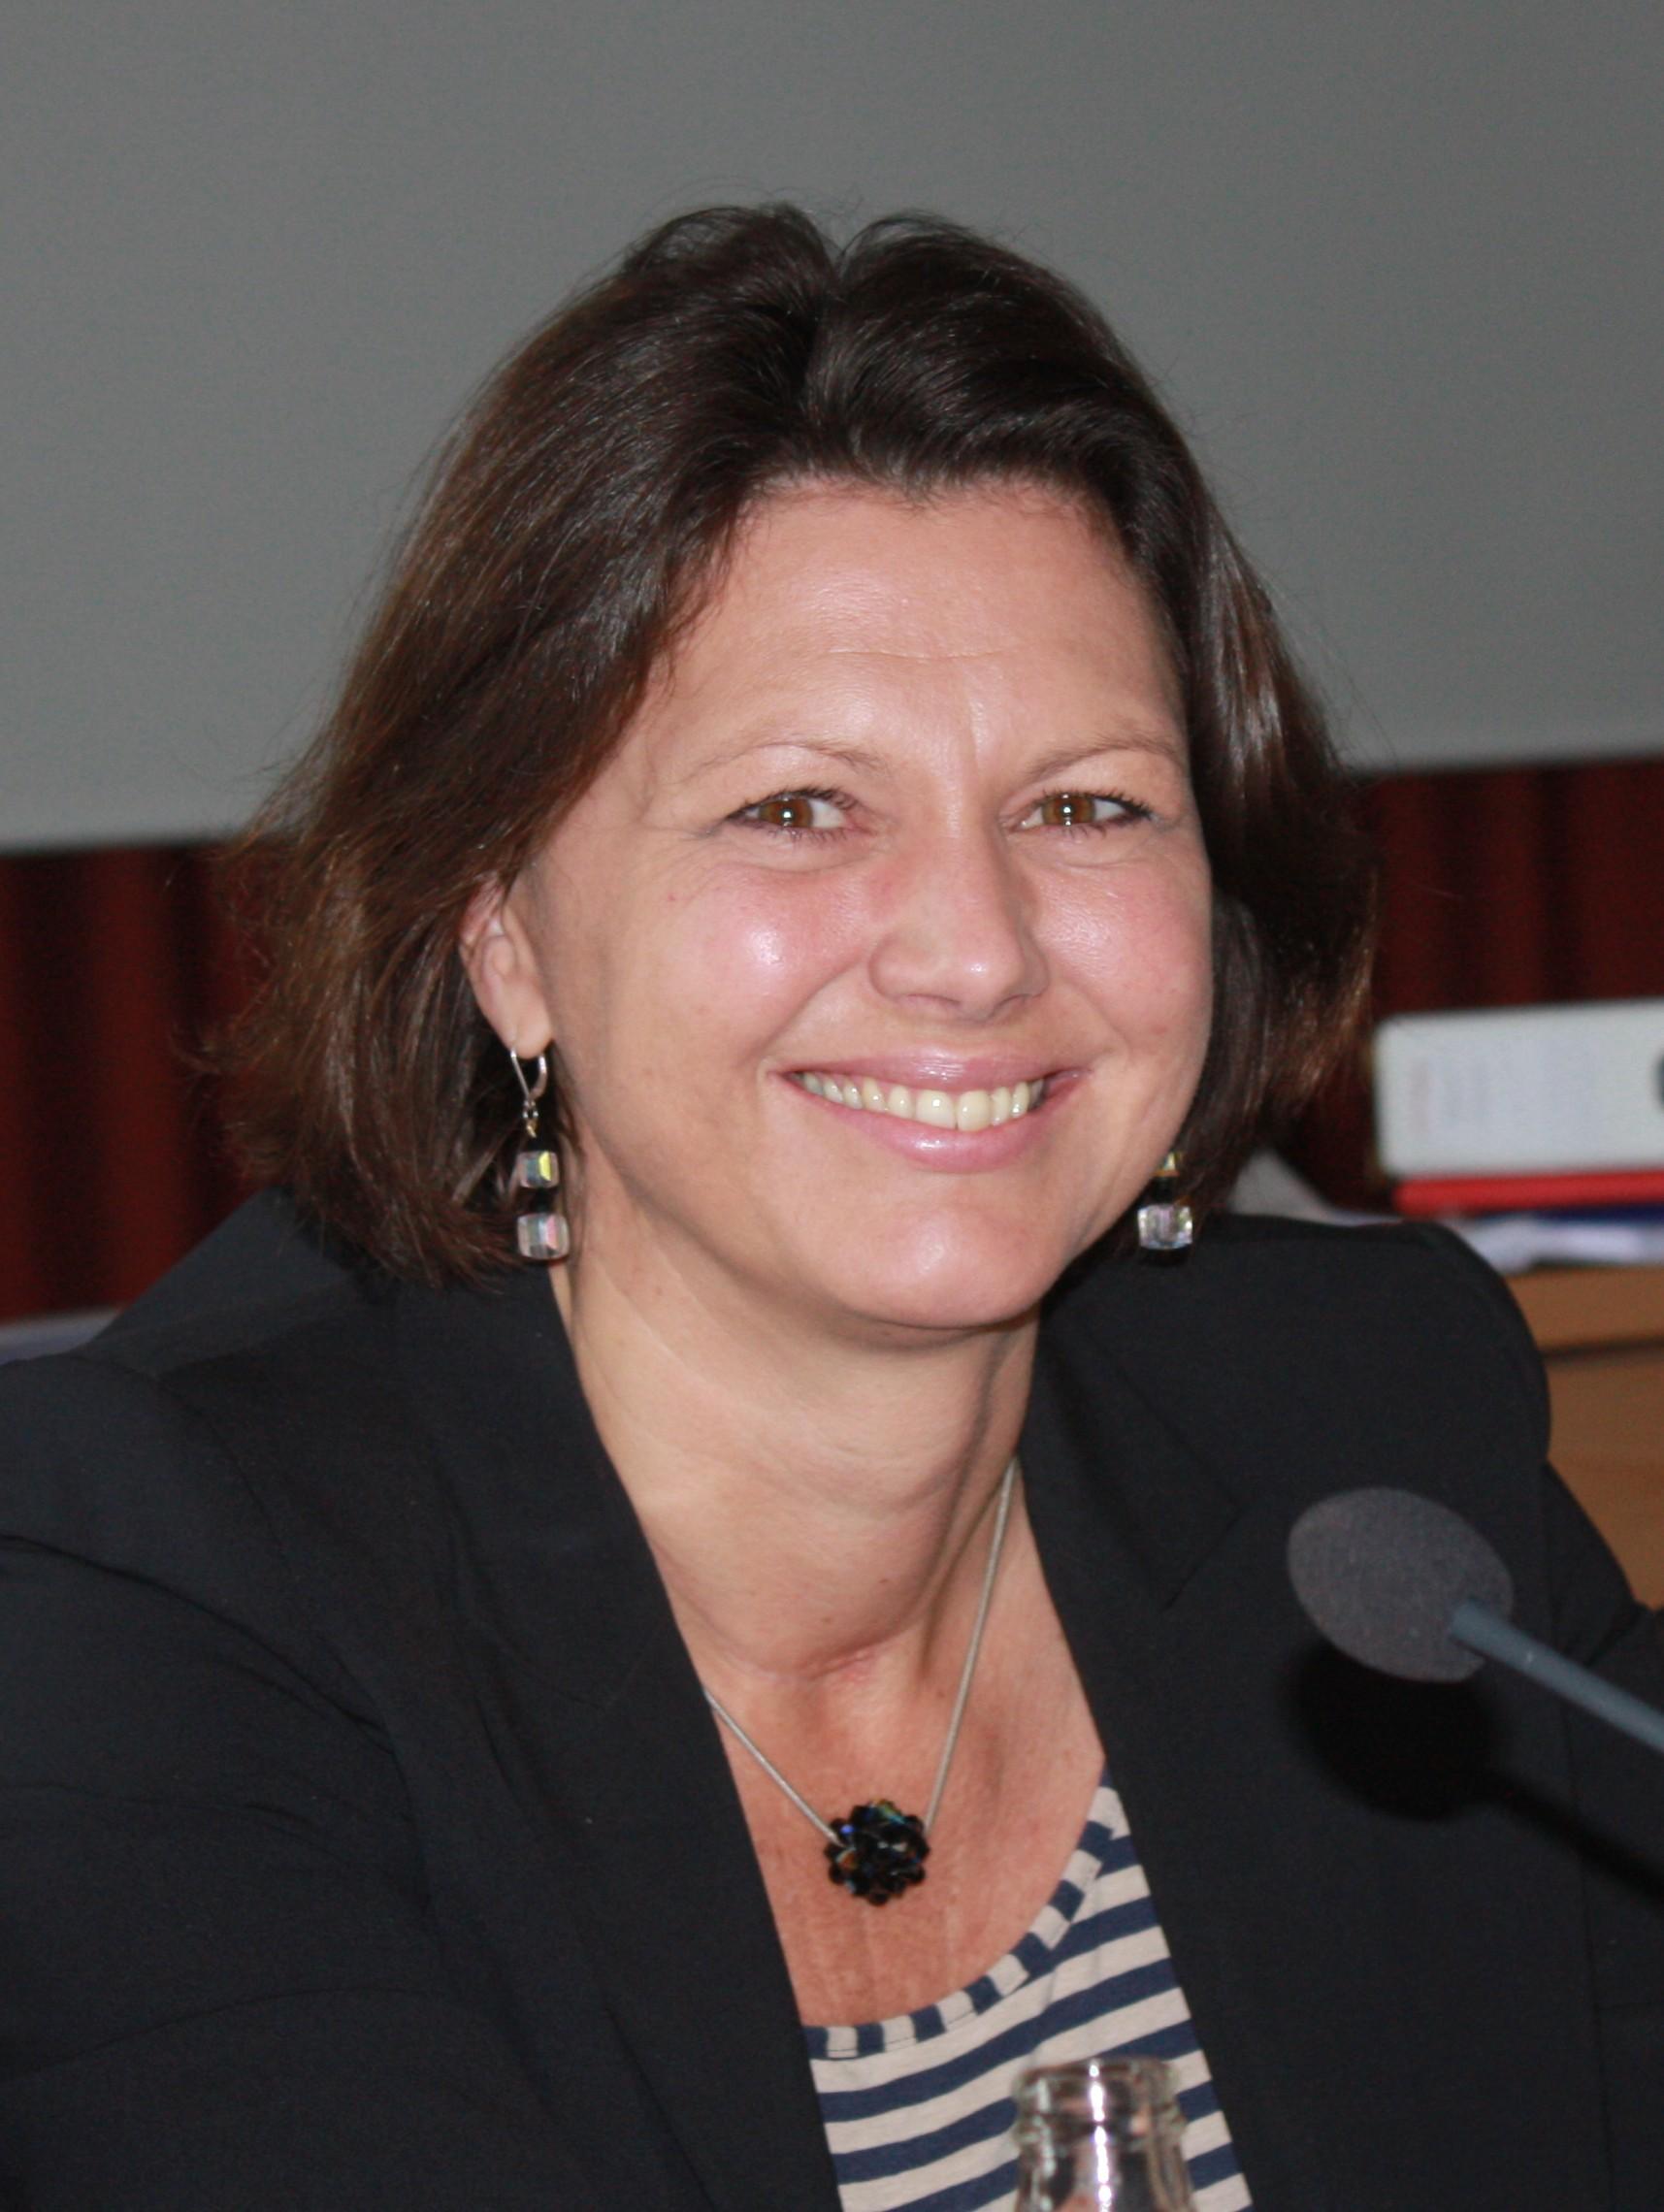 Ilse Aigner - Wikipedia, the free encyclopedia